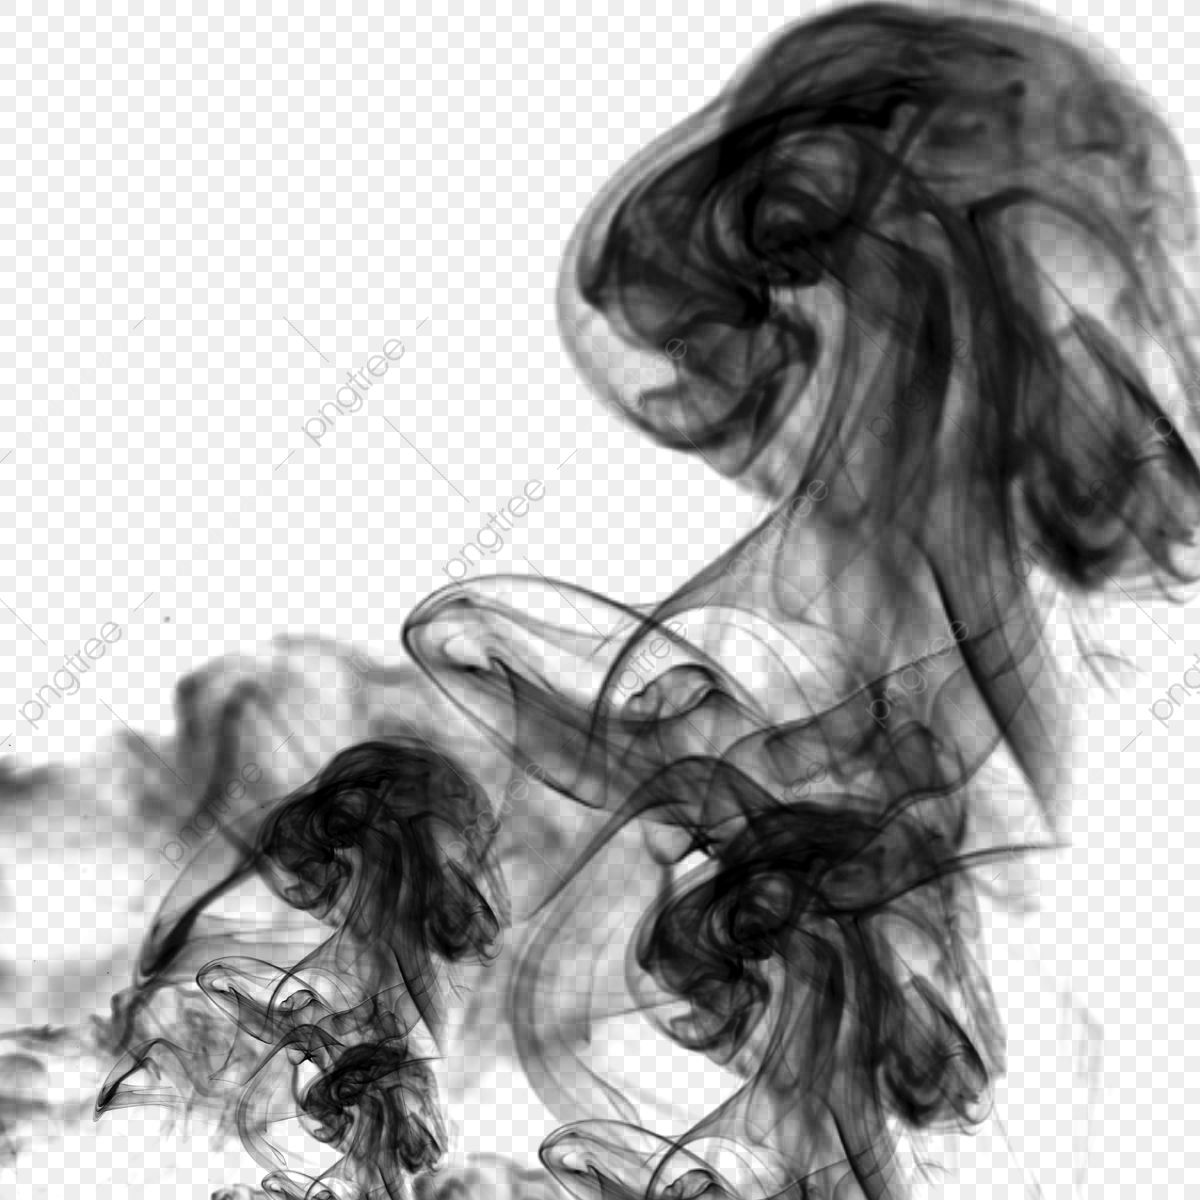 Ilustracao De Fumaca Preta Preto Fumaca Cor Imagem Png E Psd Para Download Gratuito Ilustrasi Gambar Gambar Bergerak